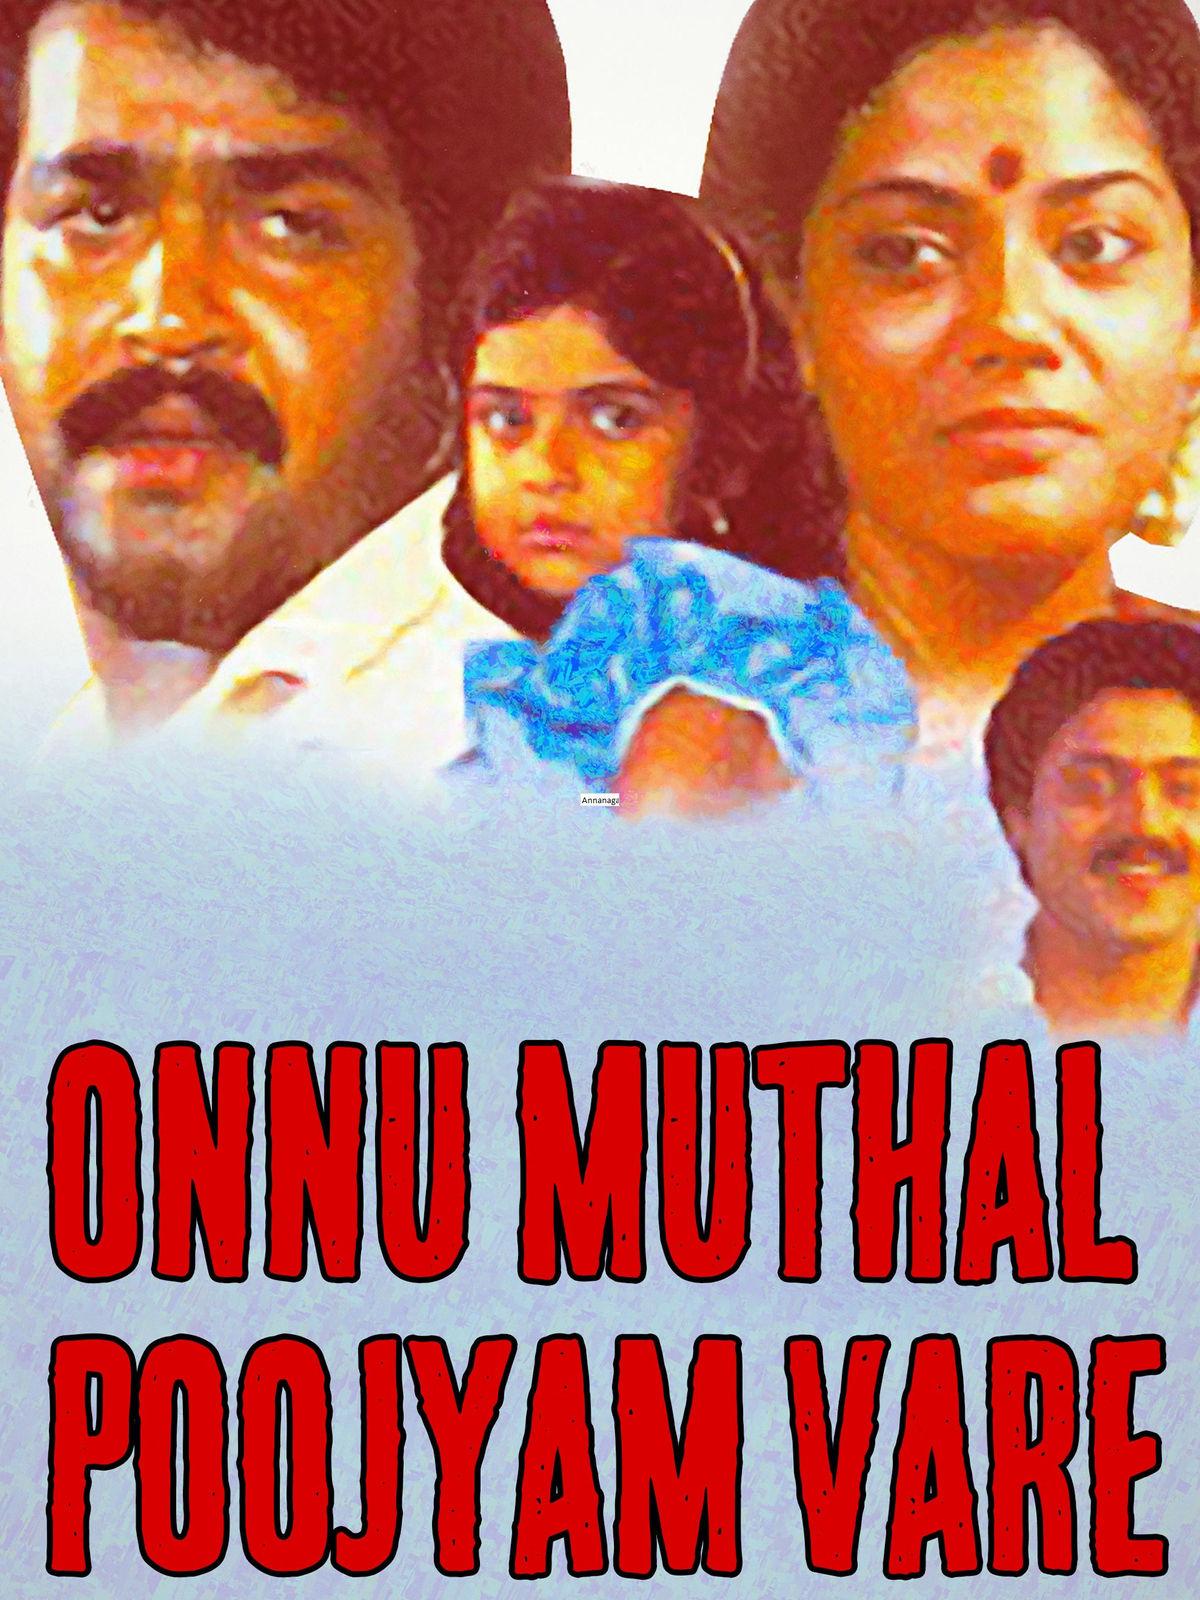 Onnu Muthal Poojyam Vare